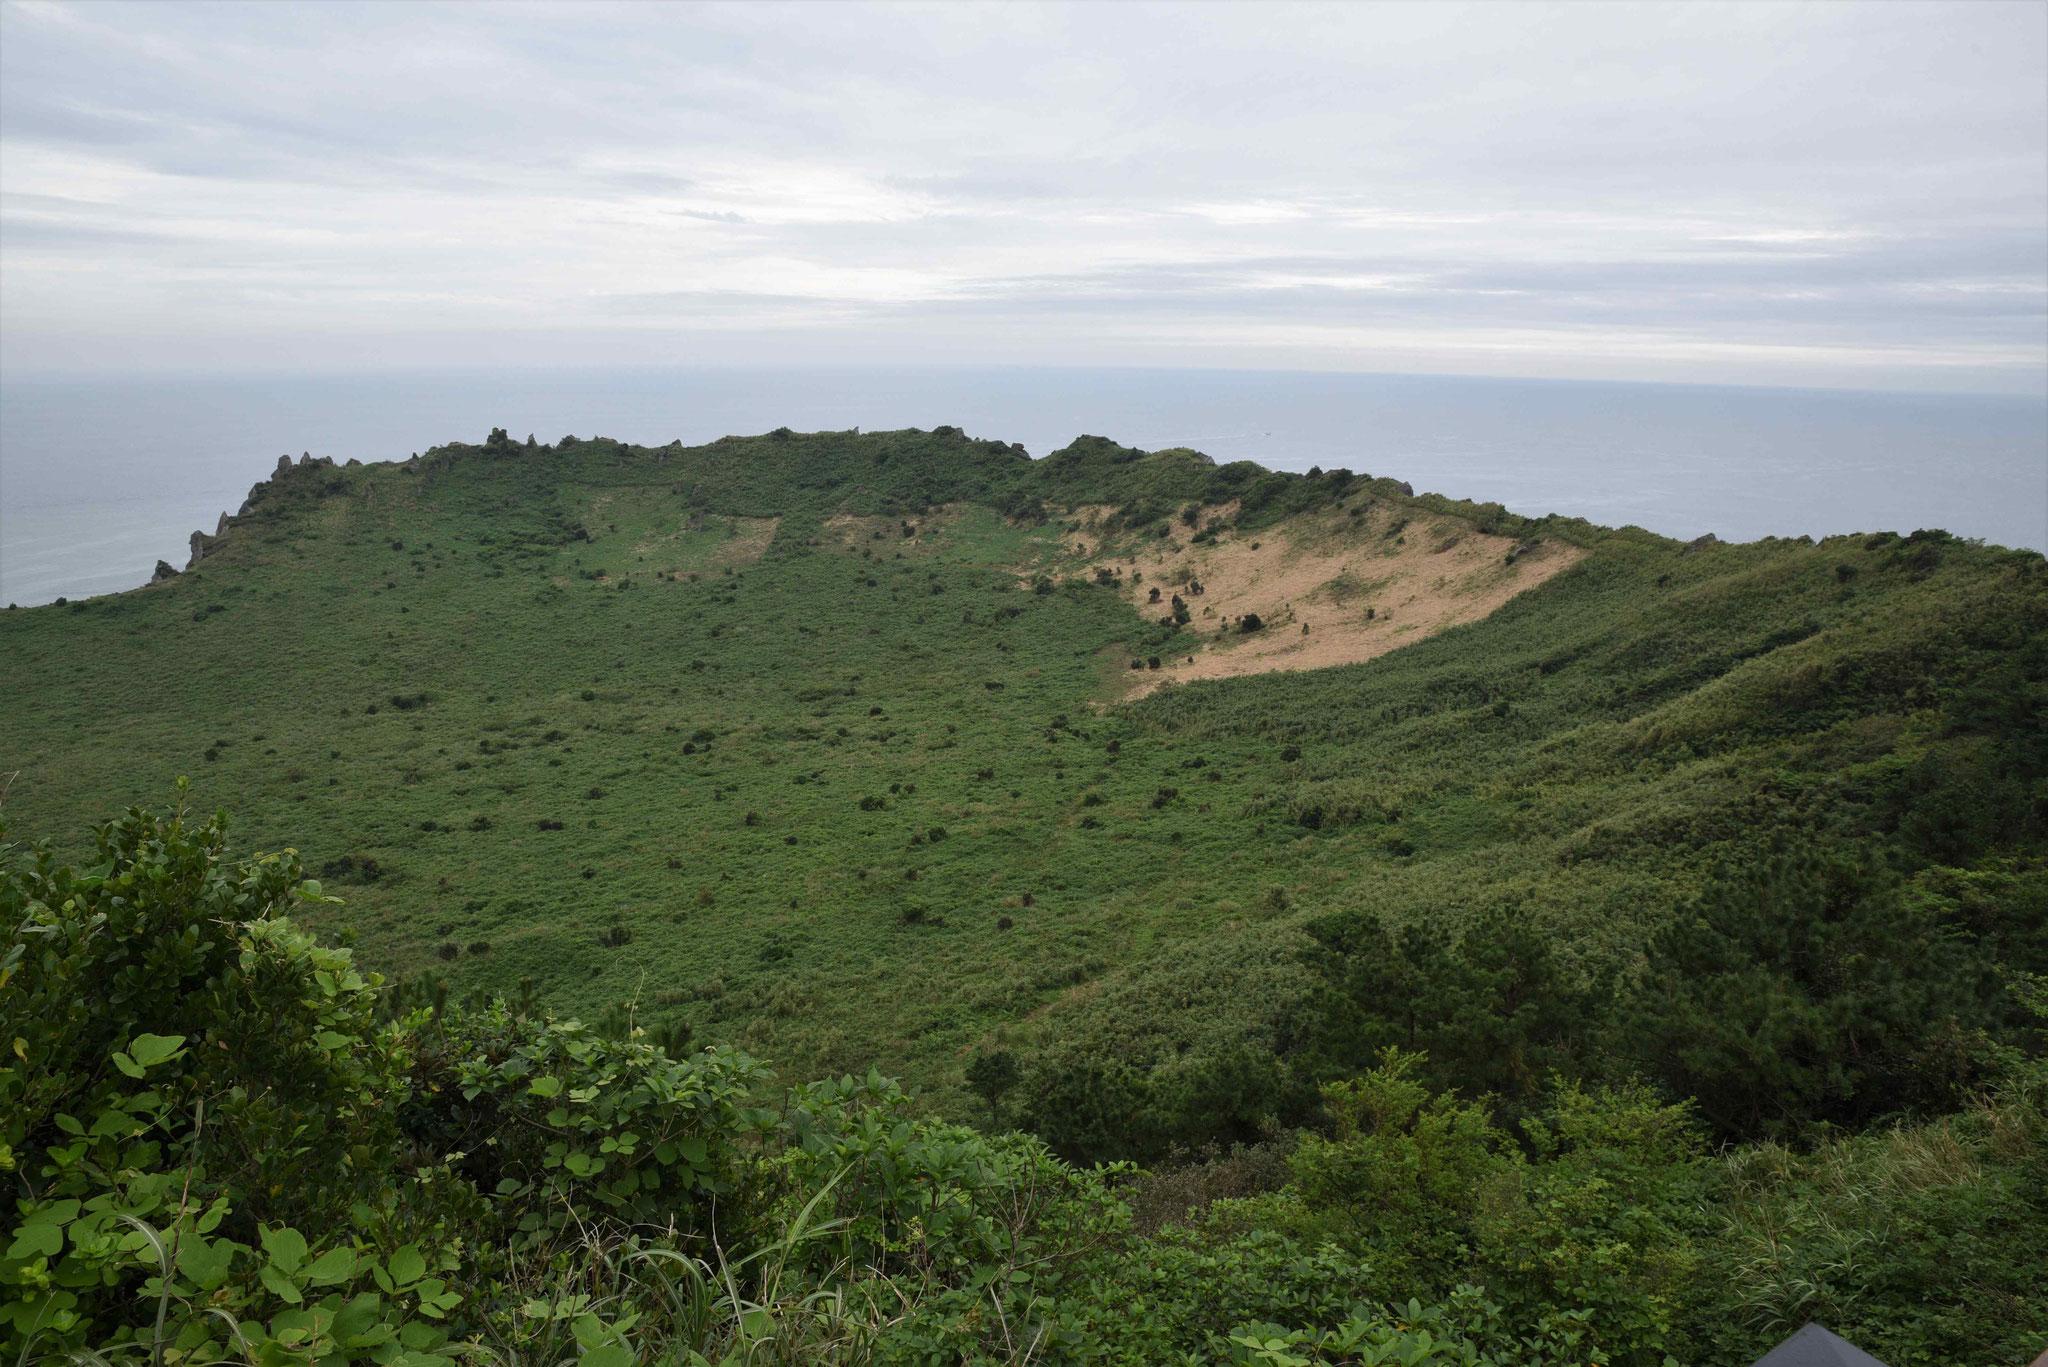 Krater des Parasitenvulkans Ilchulbong